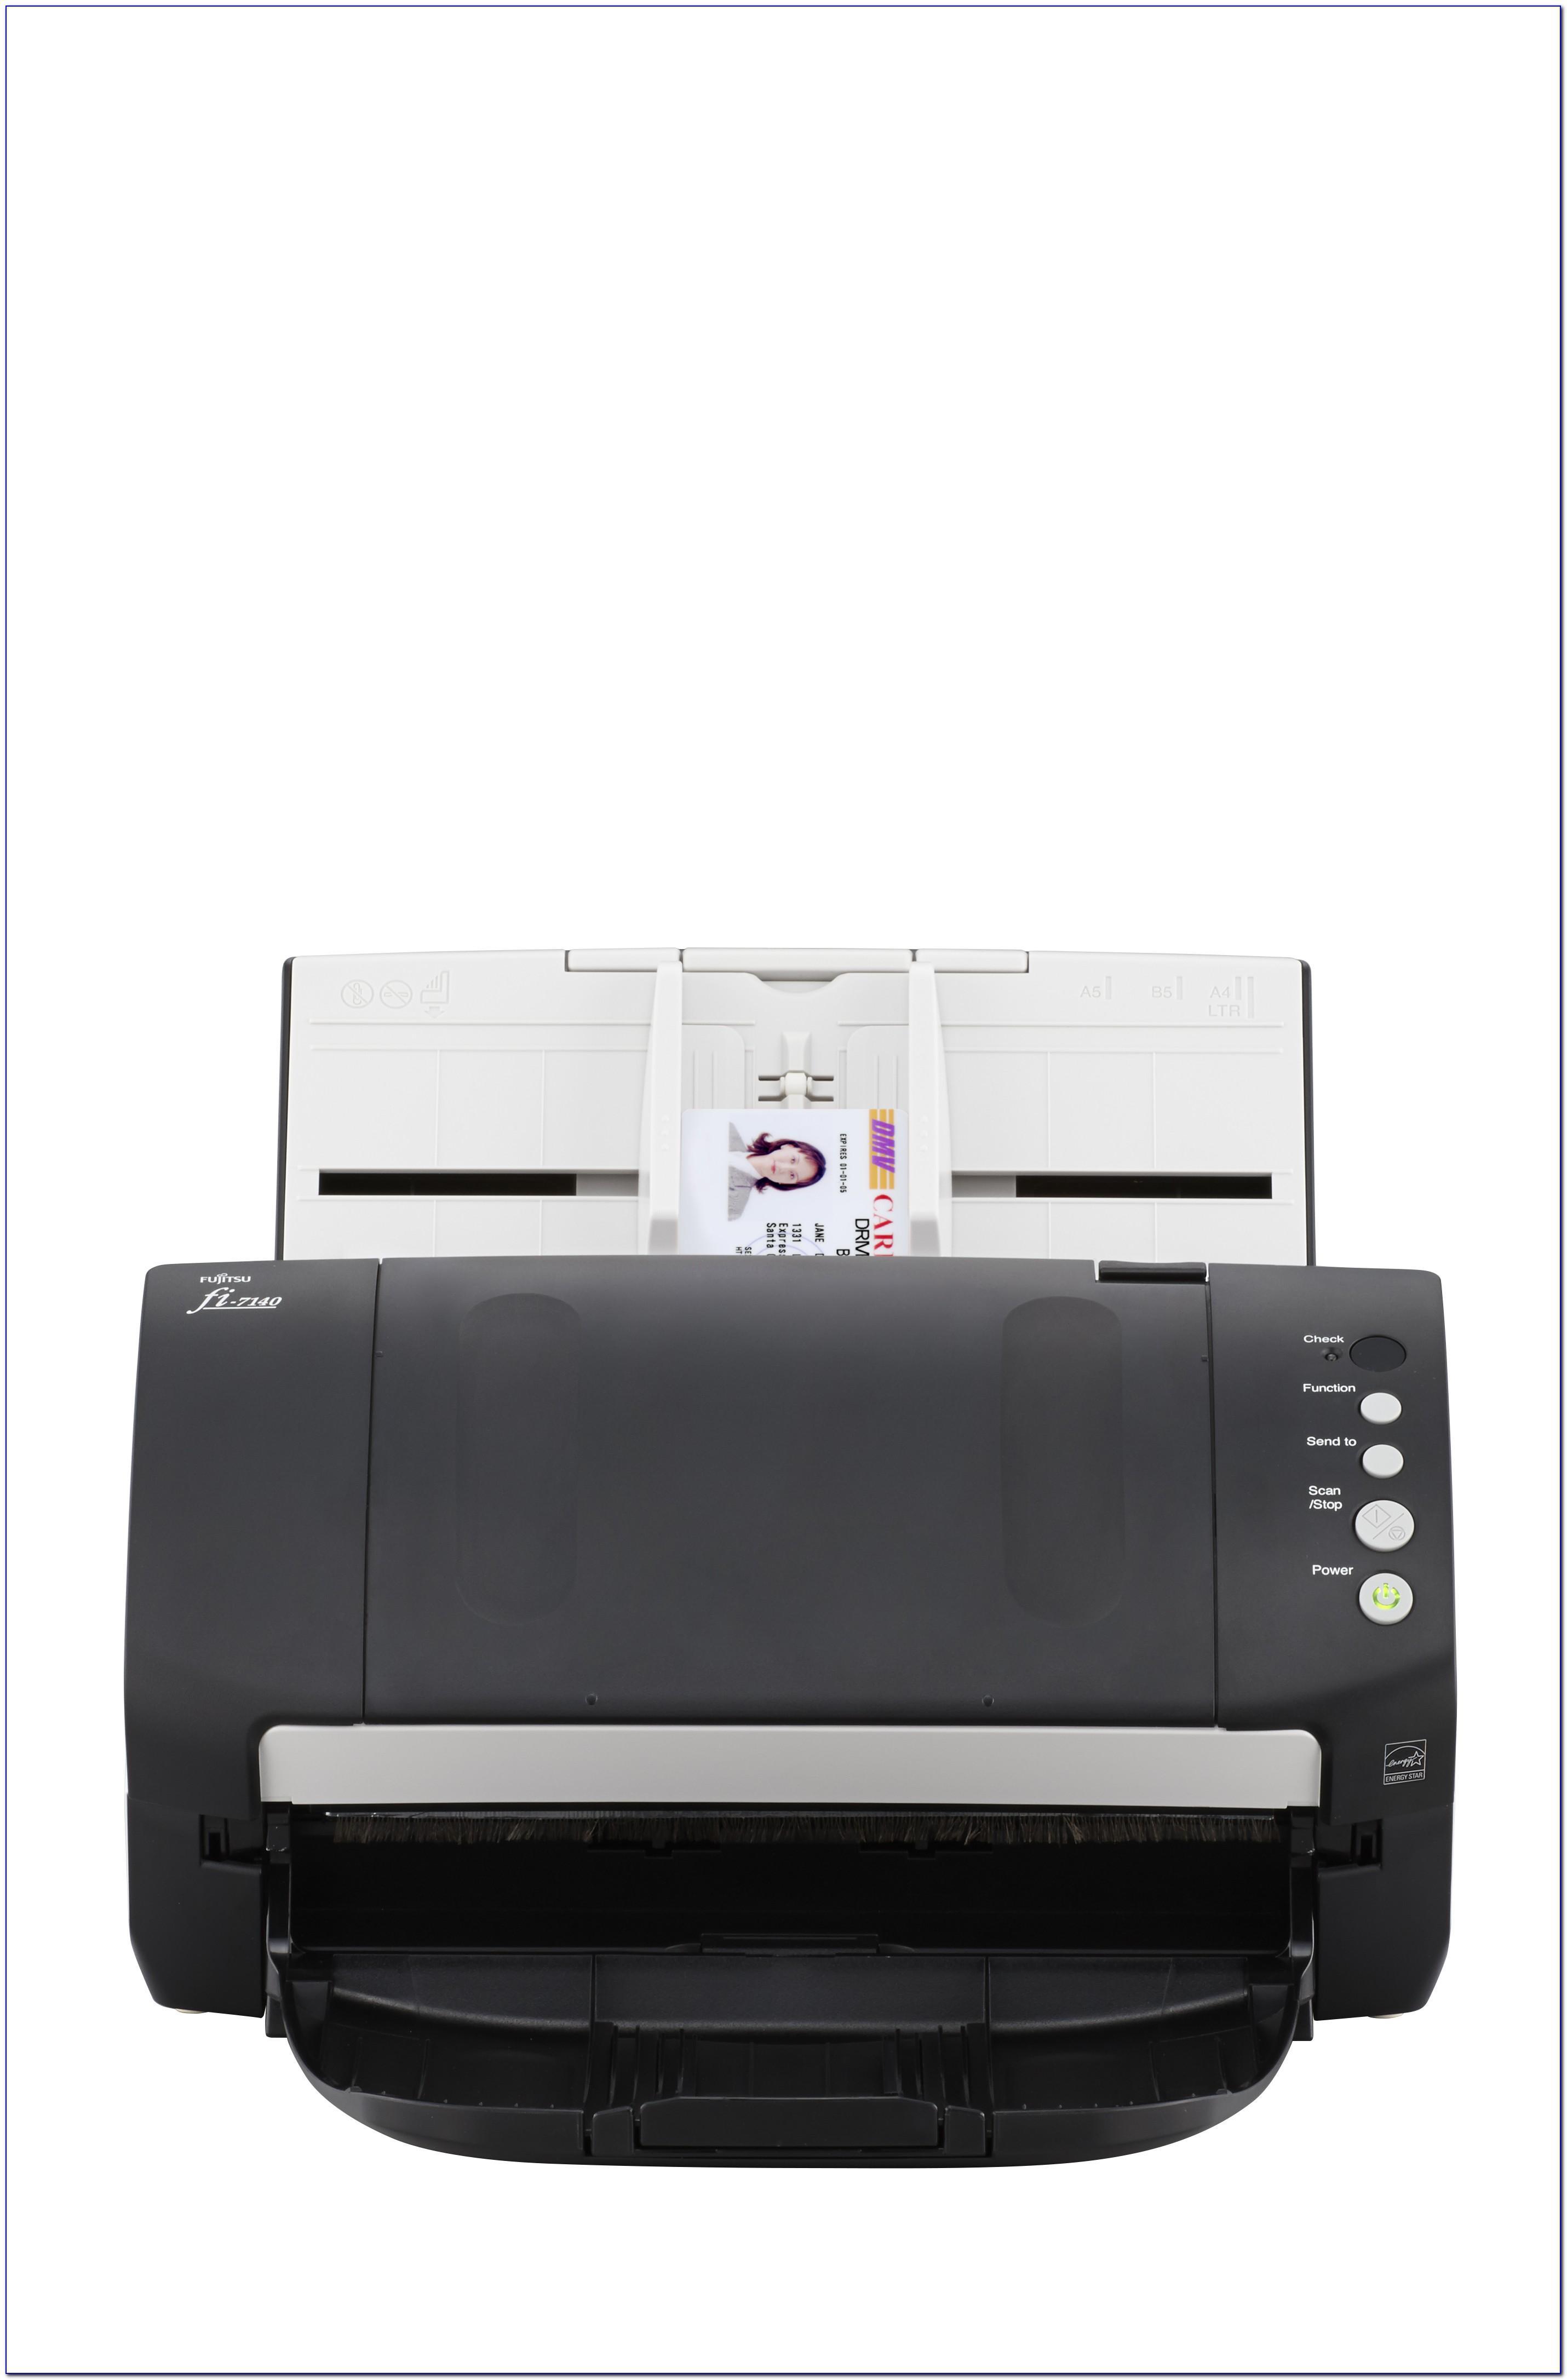 Fujitsu Fi 7700 Scanner Brochure